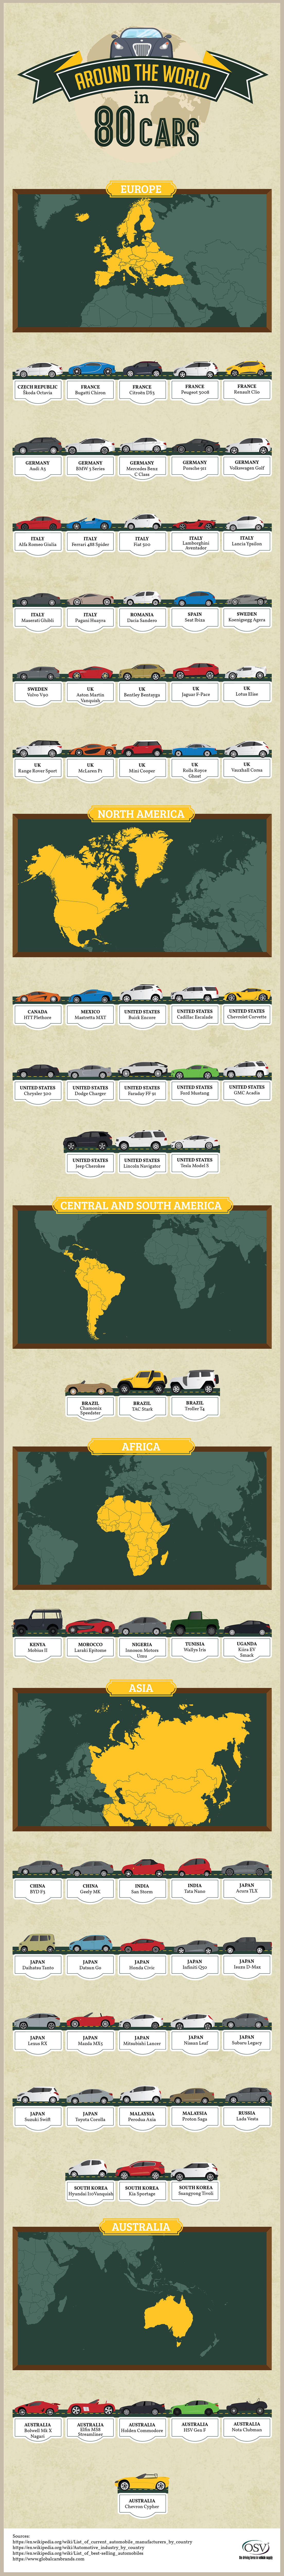 cars, car models, international, infographic